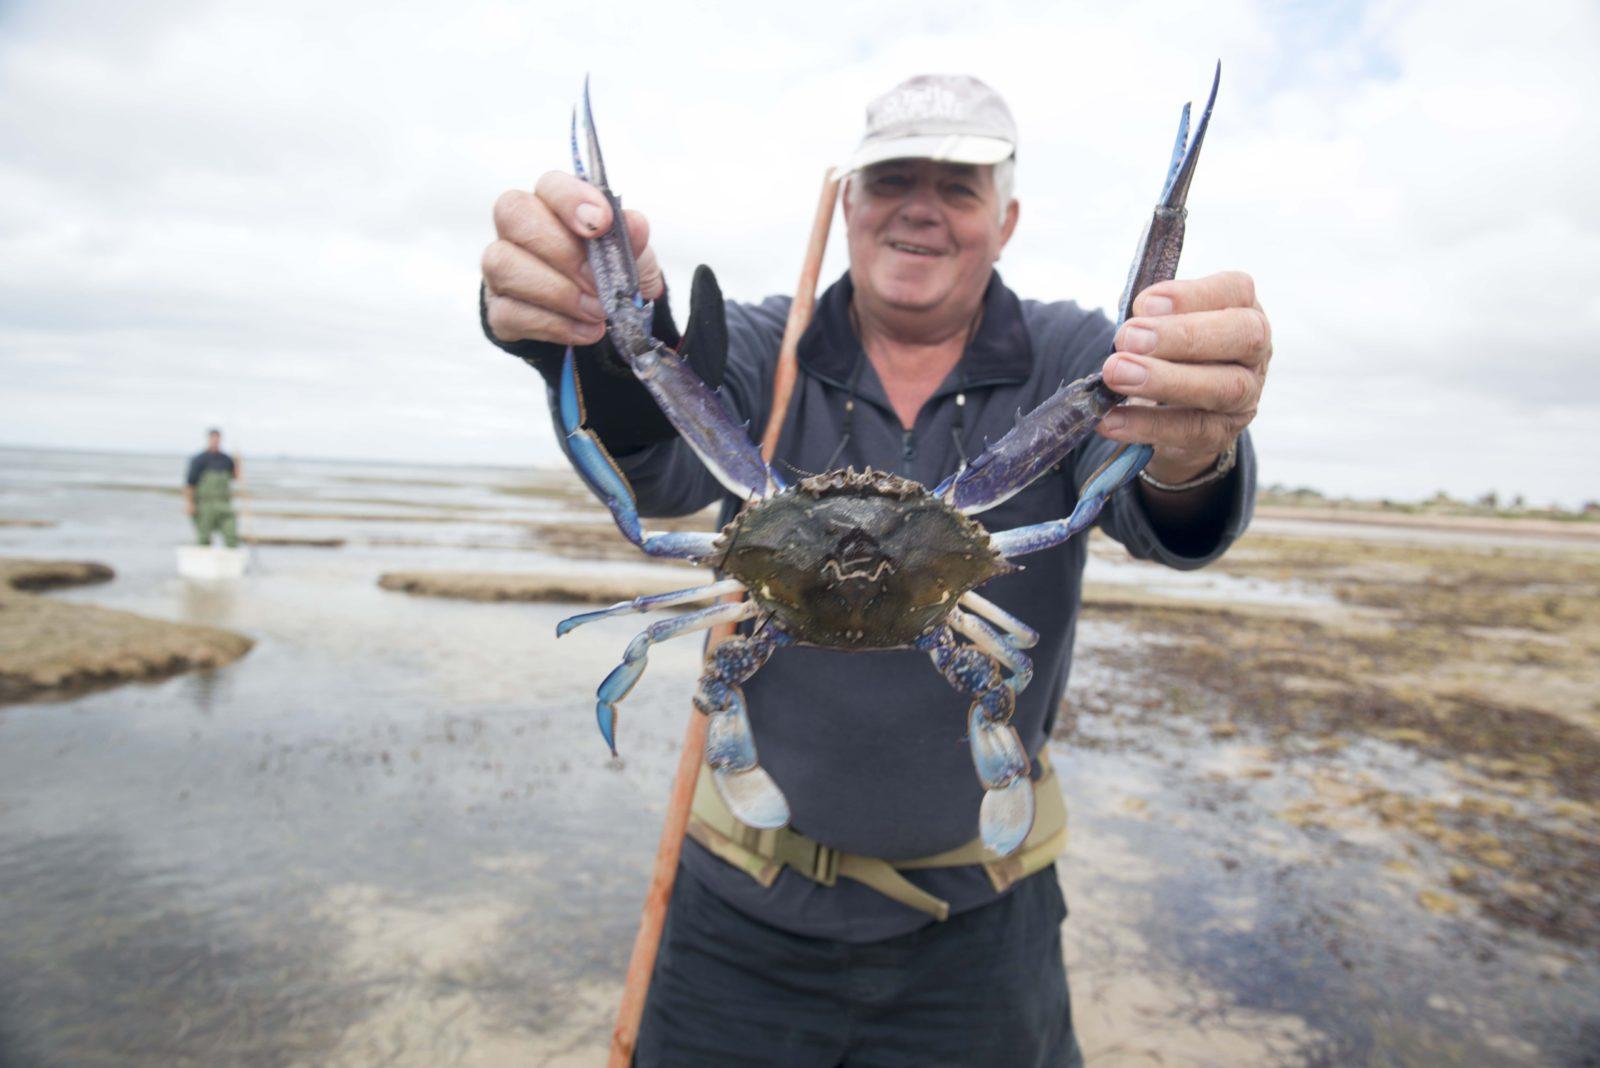 crabbing, Tiddy Widdy Beach, Yorke Peninsula, South Australia